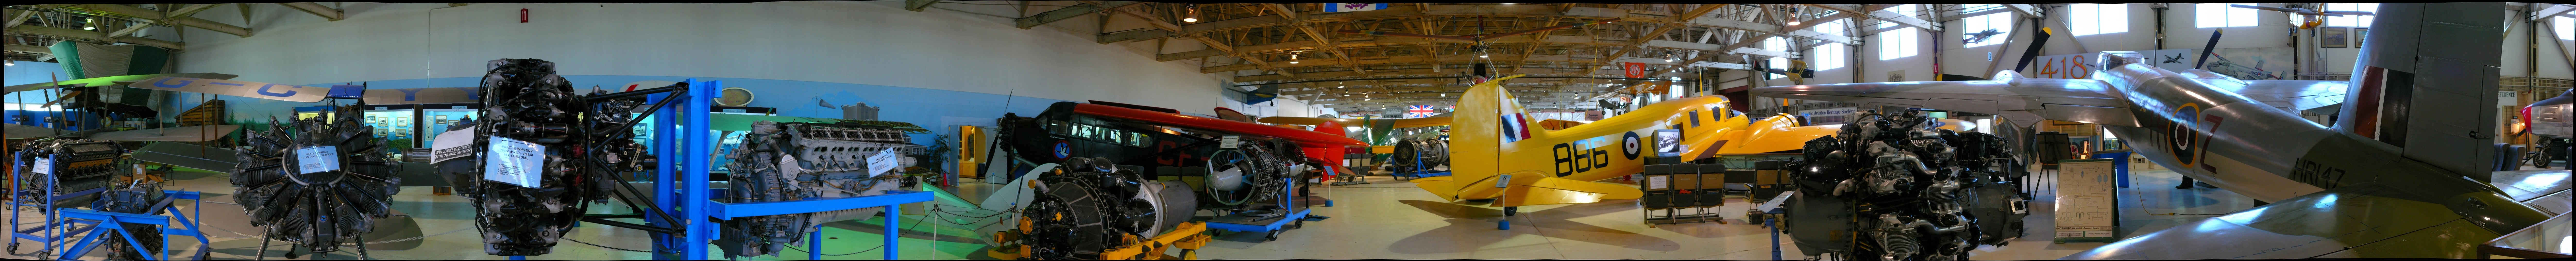 Alberta Aviation Museum 25usm.jpg